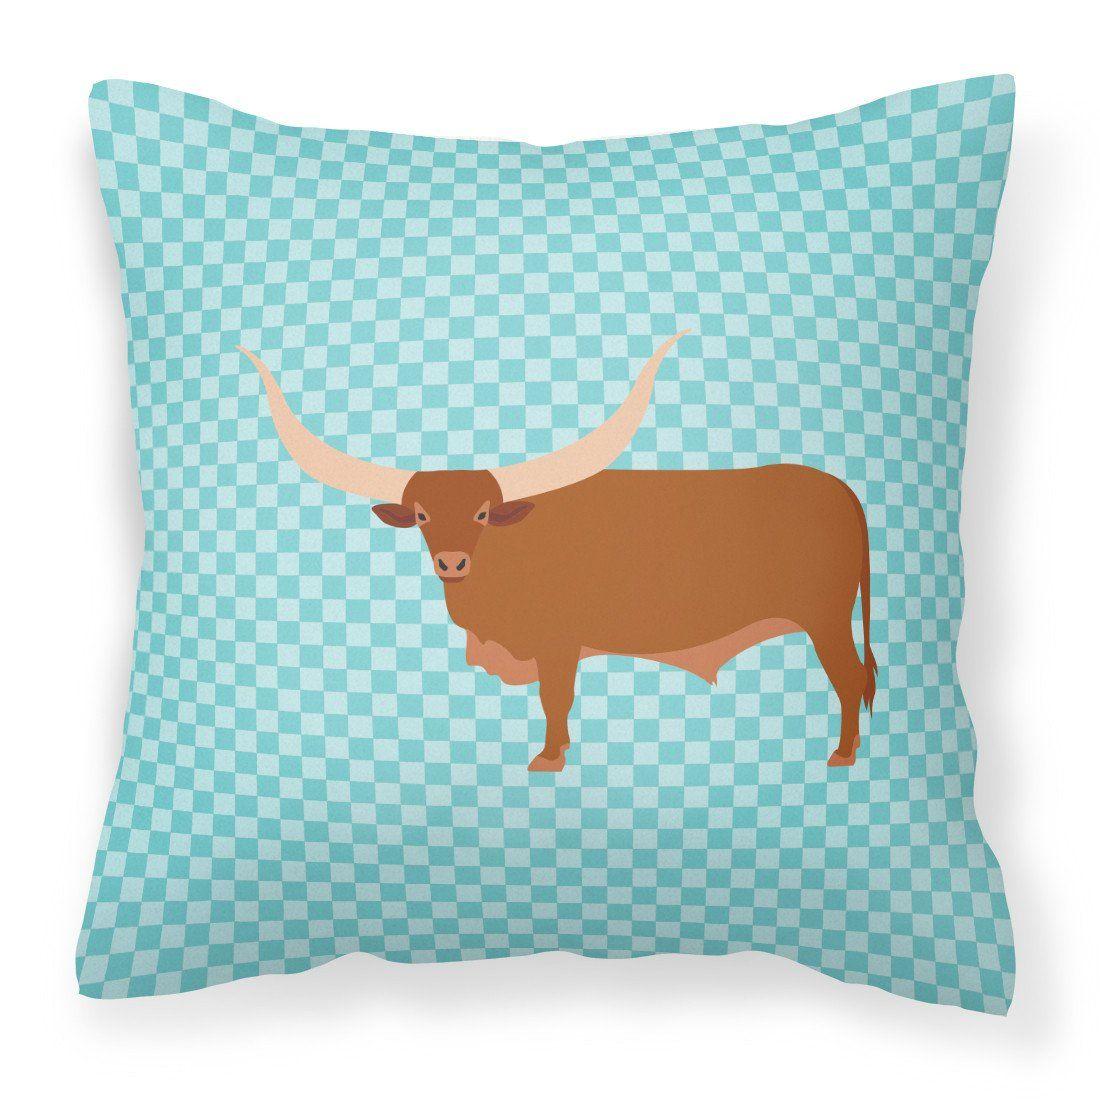 Ankole-Watusu Cow Blue Check Fabric Decorative Pillow BB7997PW1414